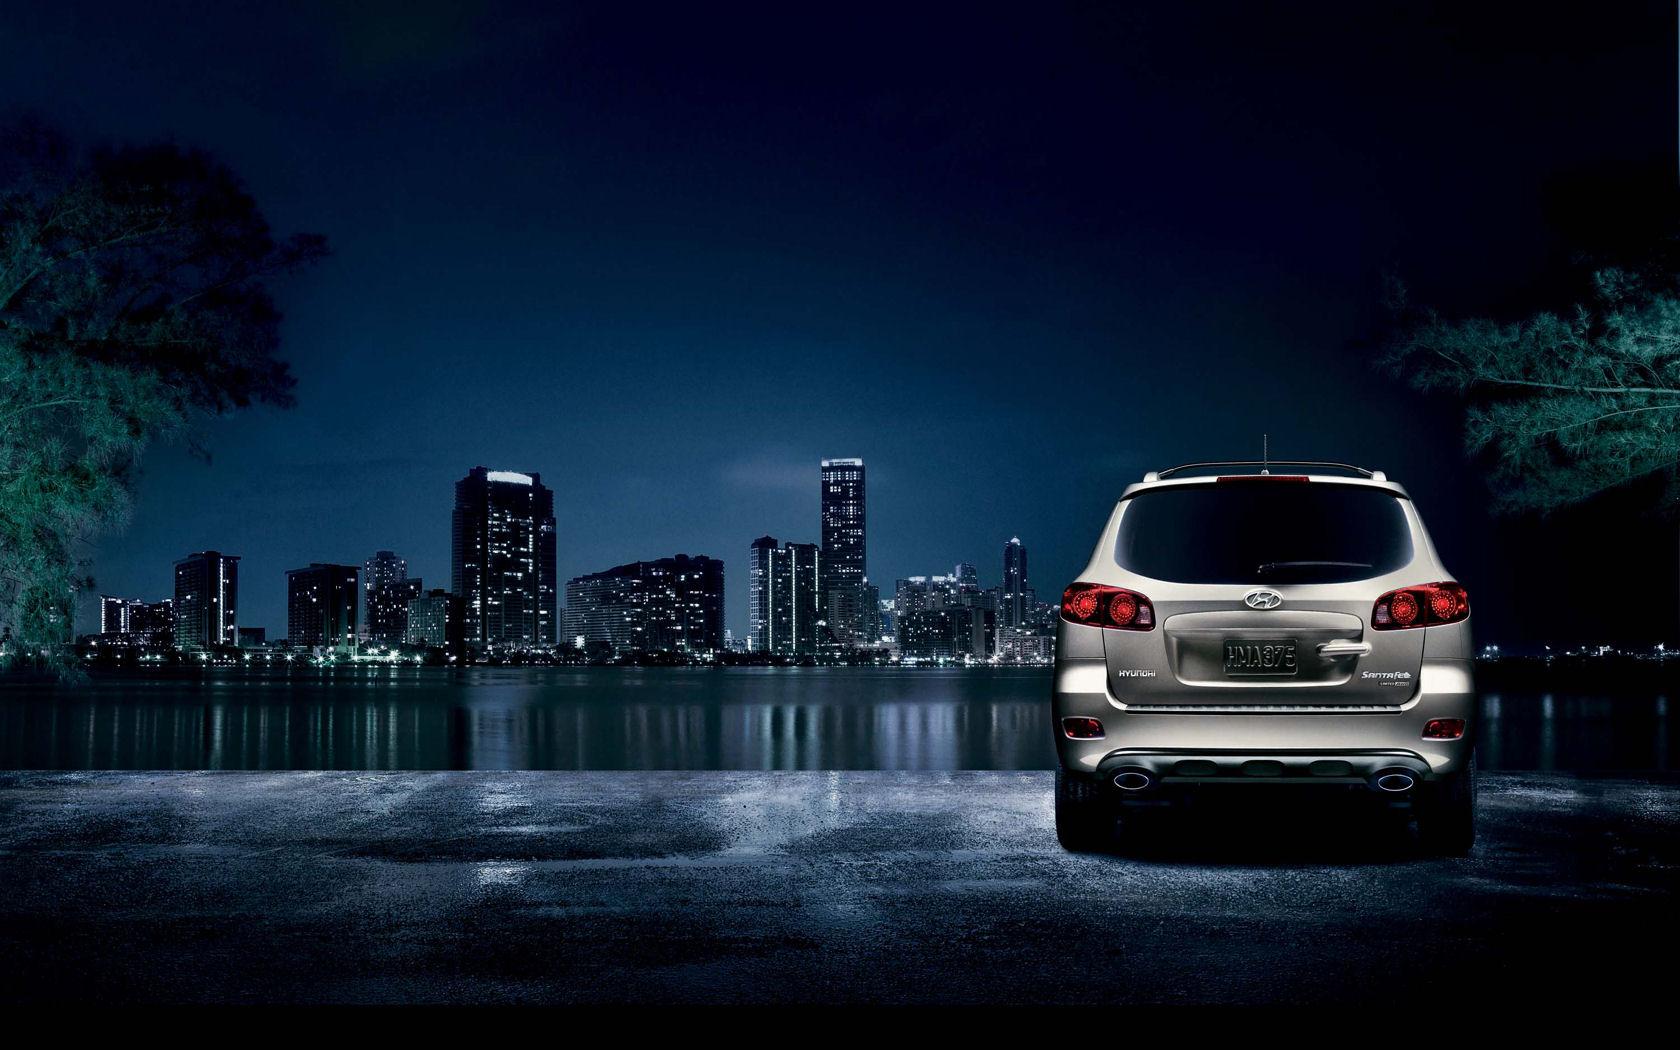 Hyundai Santa Fe GLS, SE, Limited - Free Widescreen Wallpaper / Desktop